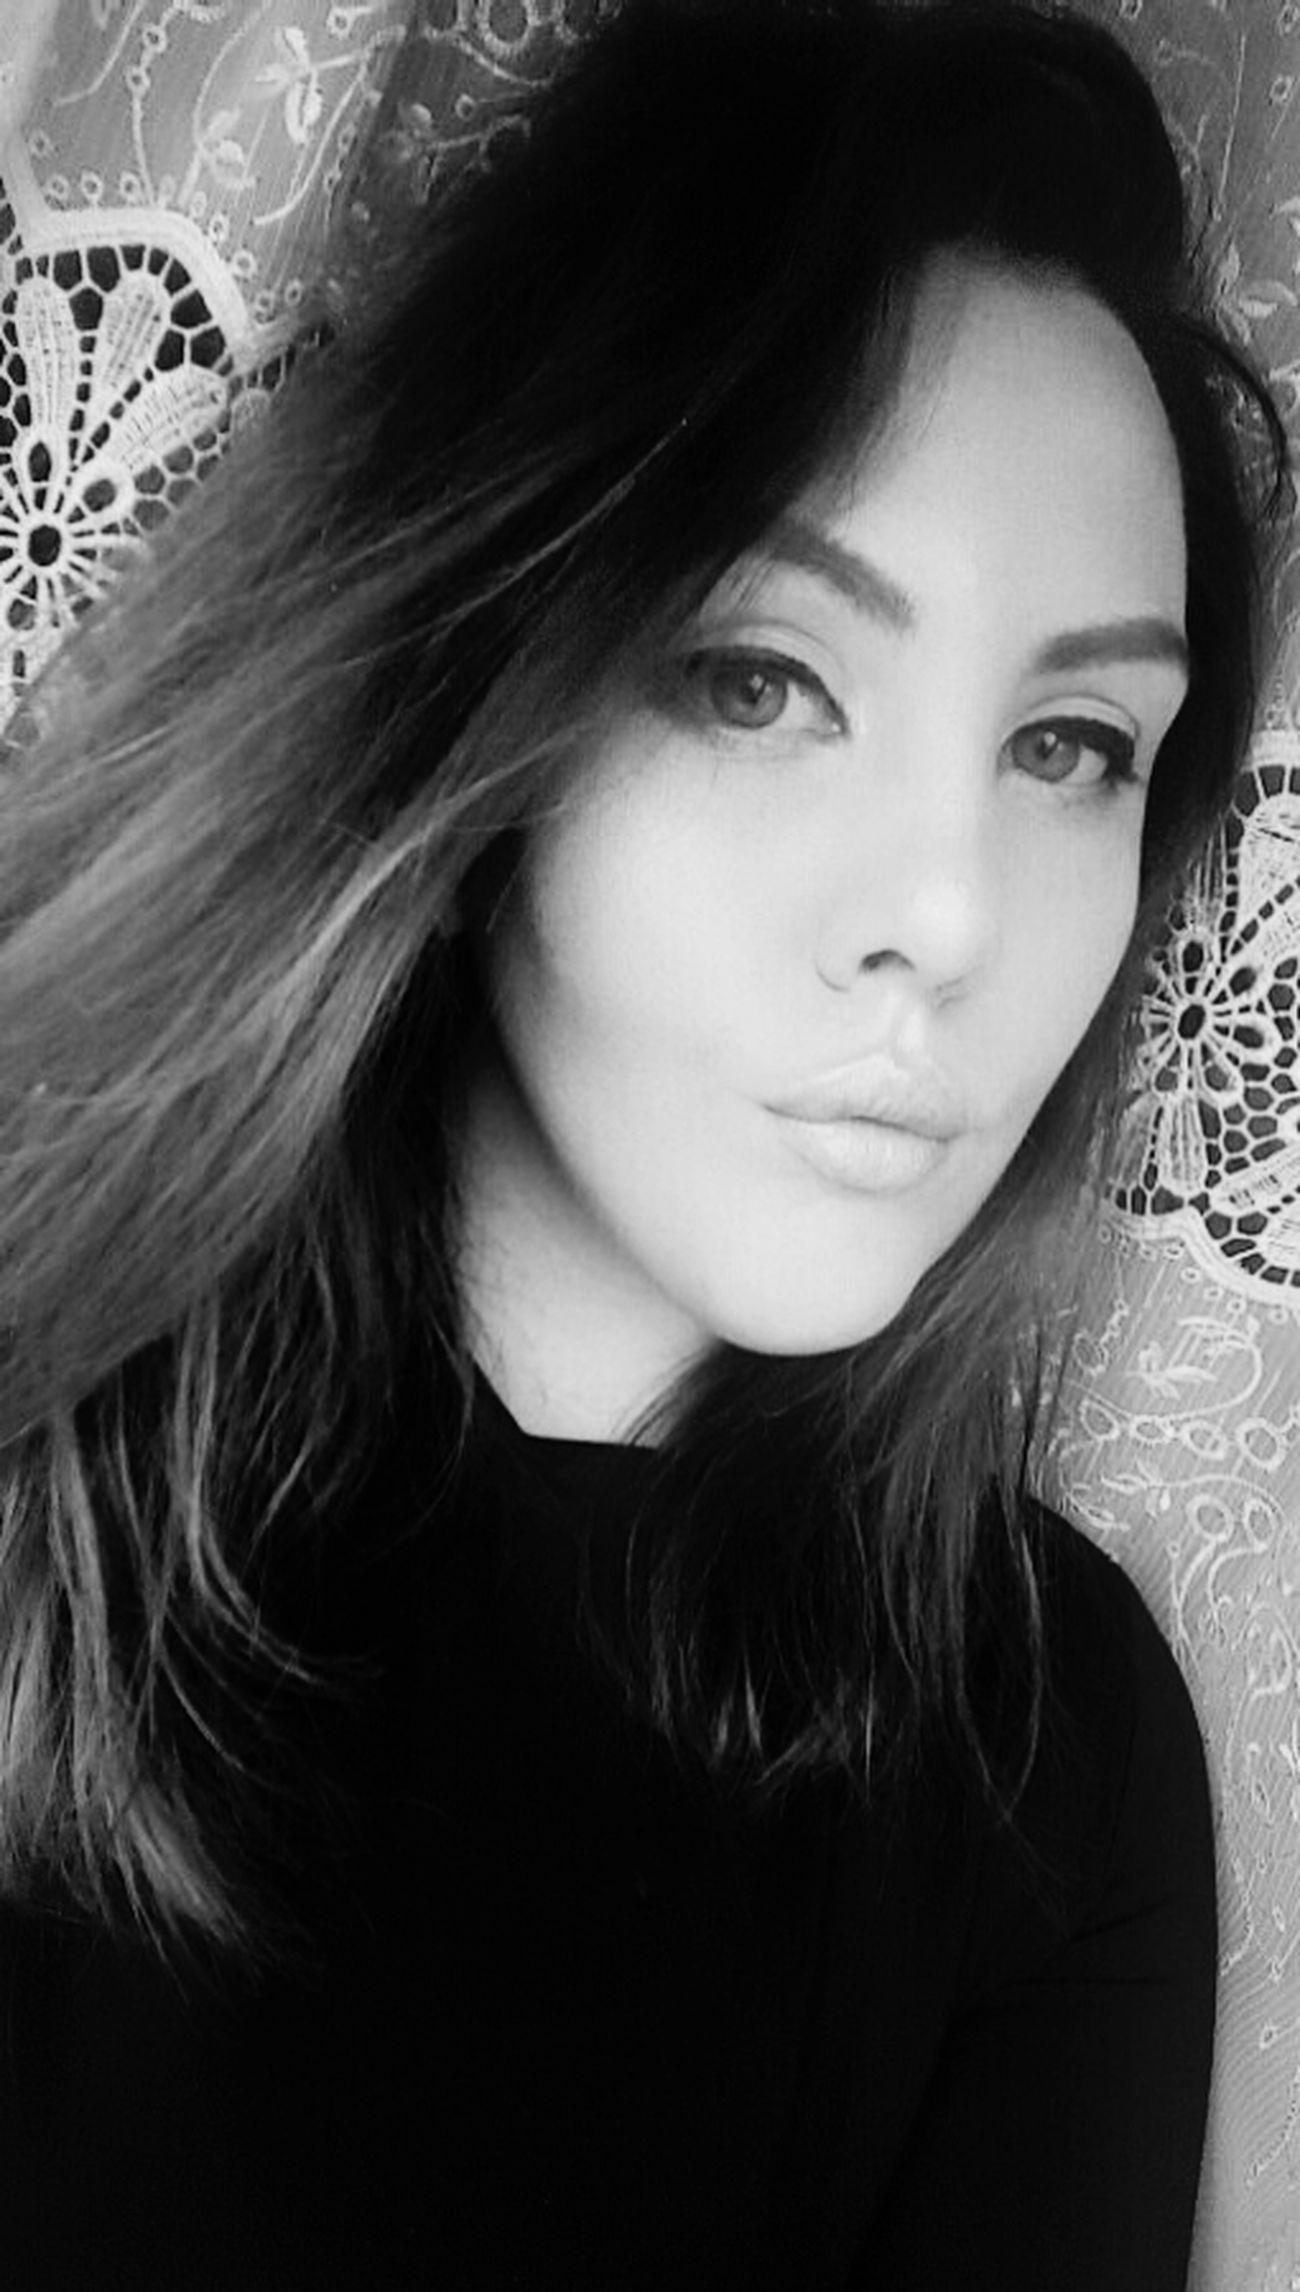 Portrait Beautiful Woman Beauty Young Women Beautiful People Smiling Babygirl Like4like Alwaysonmymind likeforlike #likemyphoto #qlikemyphotos #like4like #likemypic #likeback #ilikeback #10likes #50likes #100likes 20likes likere likeforlike #likemyphoto #qlikemyphotos #like4like #likemypic #likeback #ilikeback #10likes #50likes #100likes 20likes likere Hotformybae Photography Follow4follow FolowMe ✌ Likemyphoto Selfie Myprofile Followme Likemypicture Damn I Look GOOD  Hottie Likes Lips Seductive